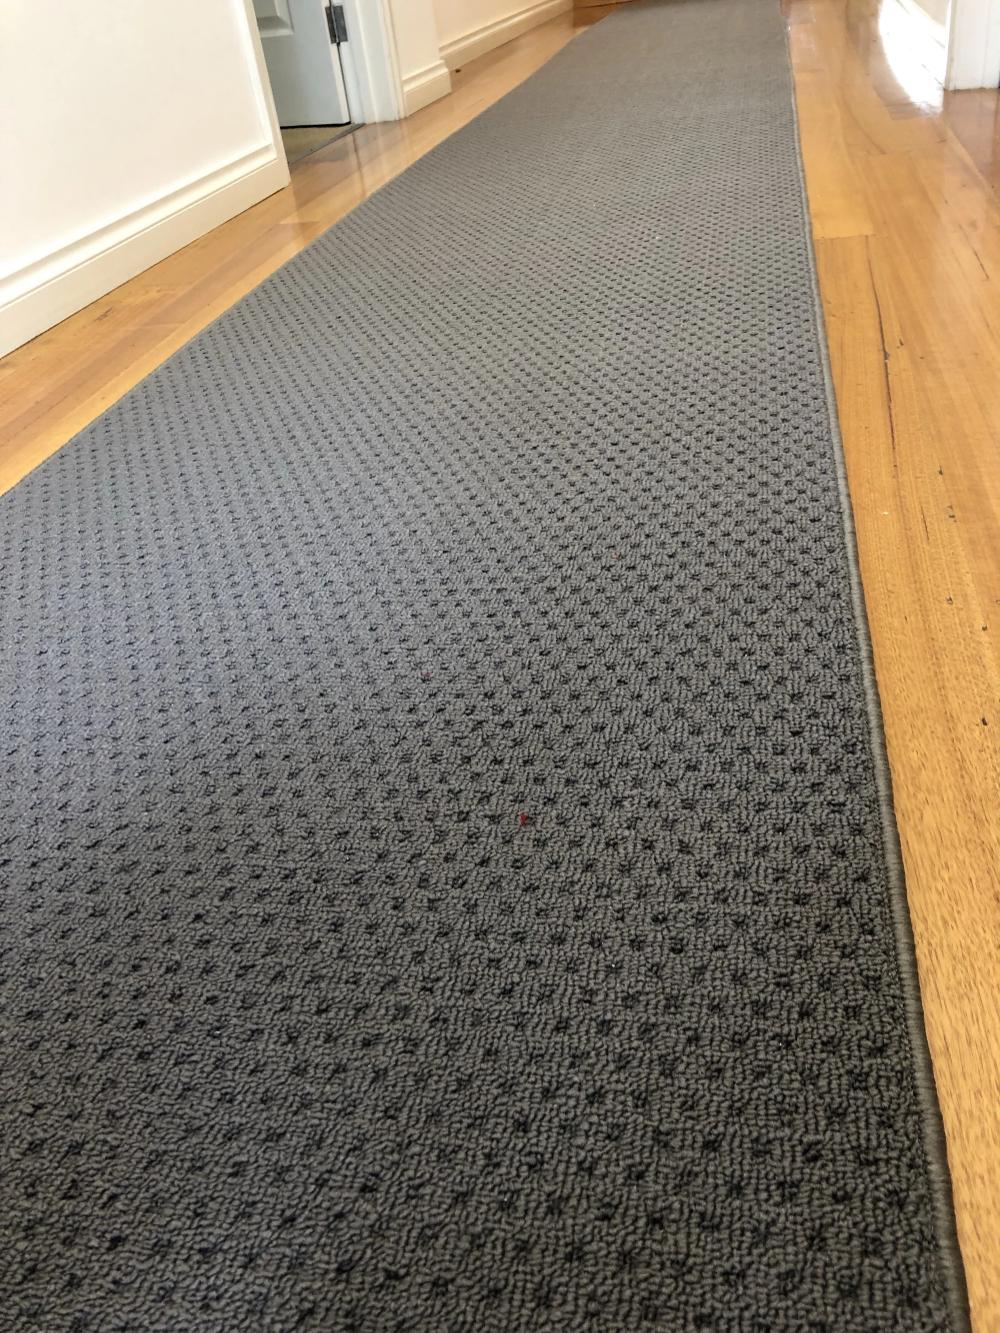 Pablo Grey Carpet Hall Runner Rug Rug Love Grey Carpet Hall Runner Rugs Grey Carpet Runner